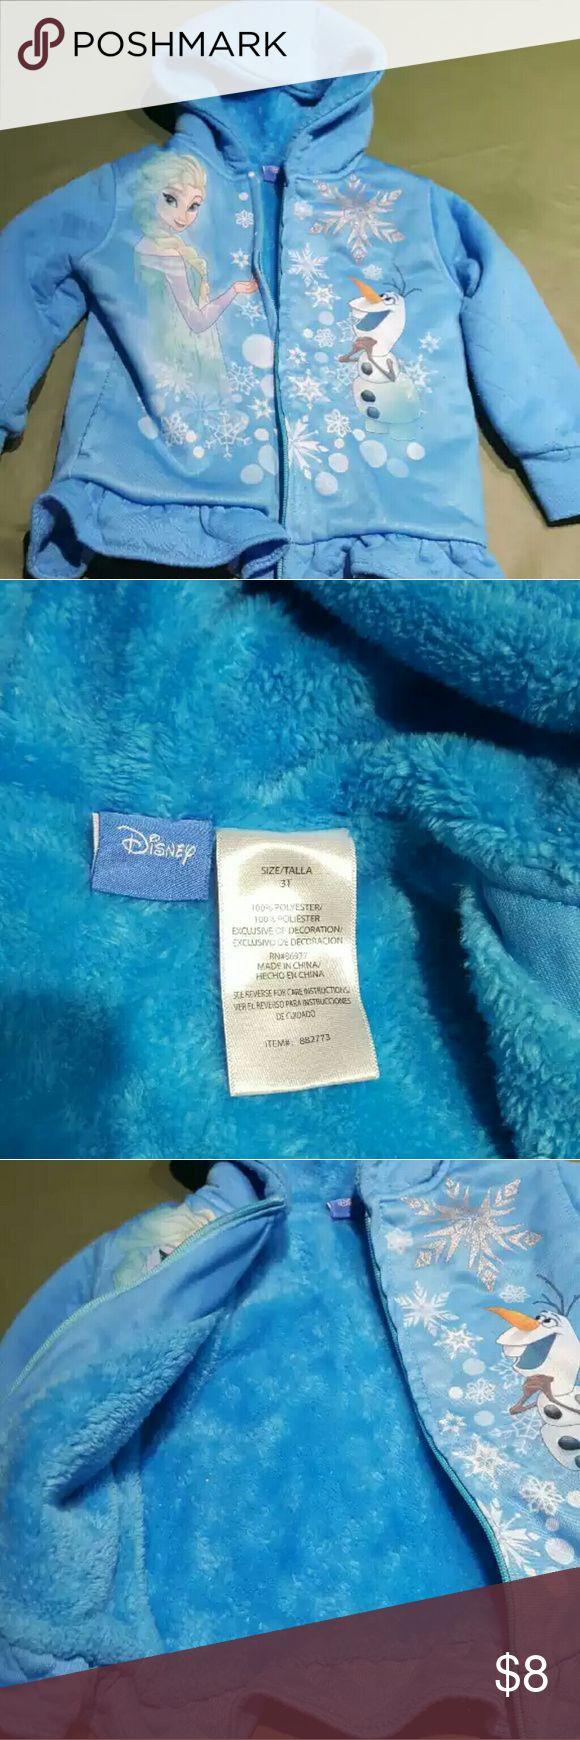 Disney Frozen hoodie 3T Warm and soft hoodie for girls 3T Disney Frozen  Shirts & Tops Sweatshirts & Hoodies